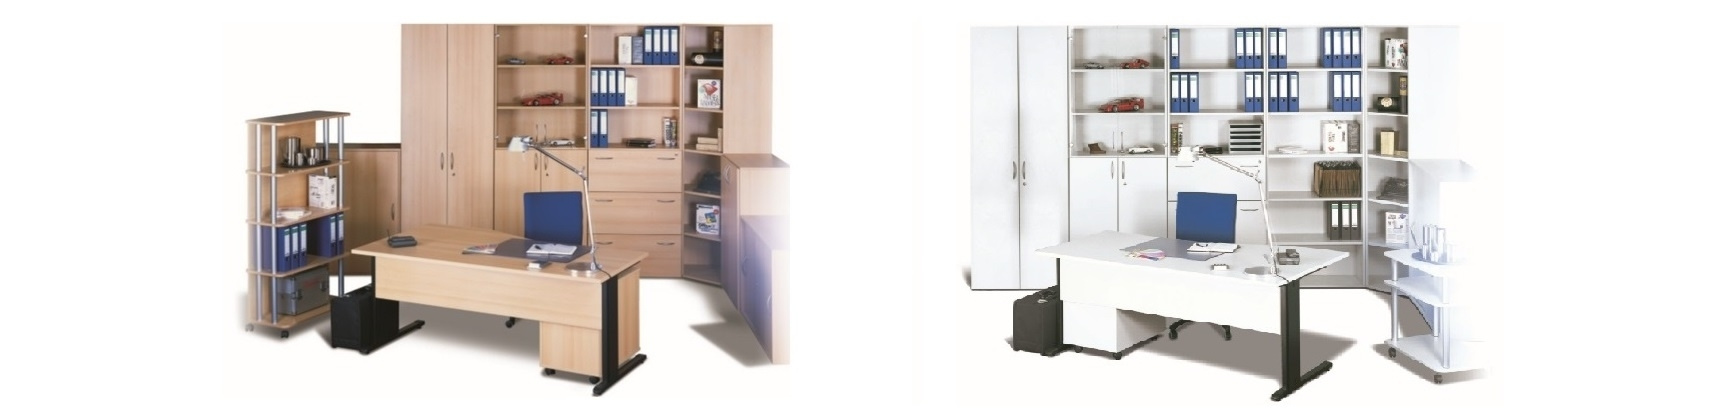 Büromöbel Hausprogramm | GWV Büromöbel gebraucht - sofort lieferbar